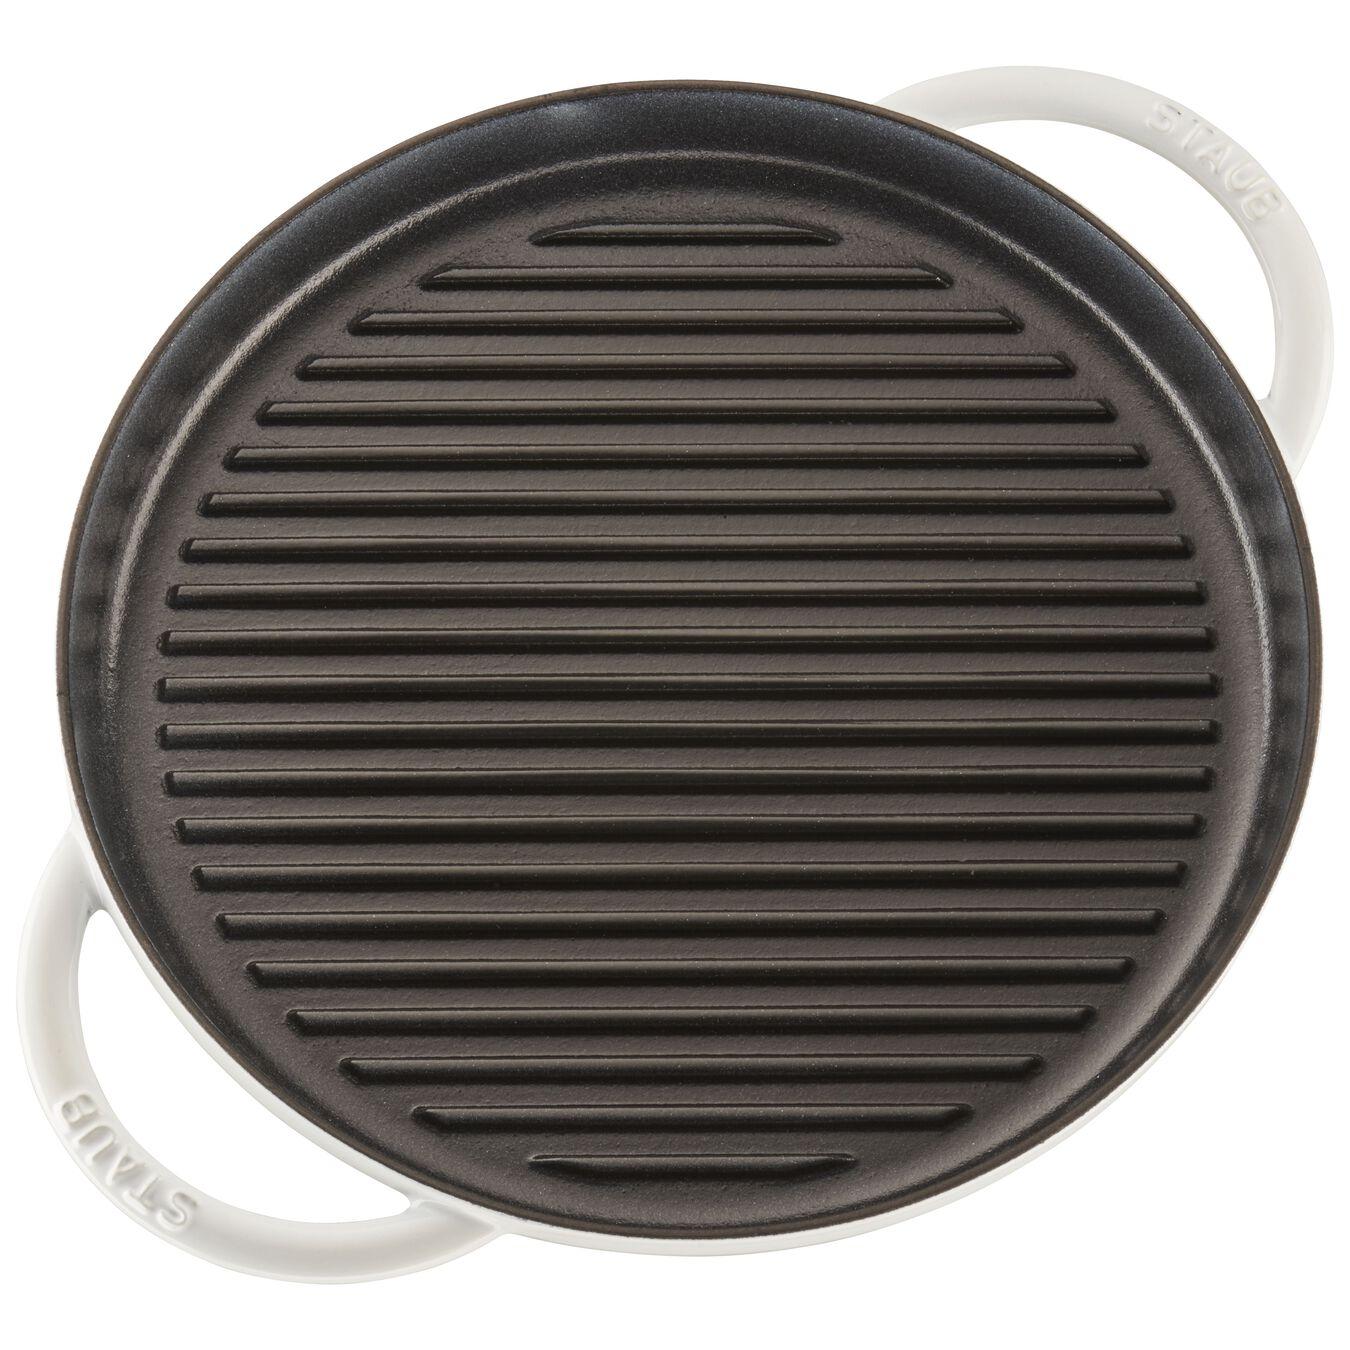 12-inch Round Steam Grill - White,,large 5